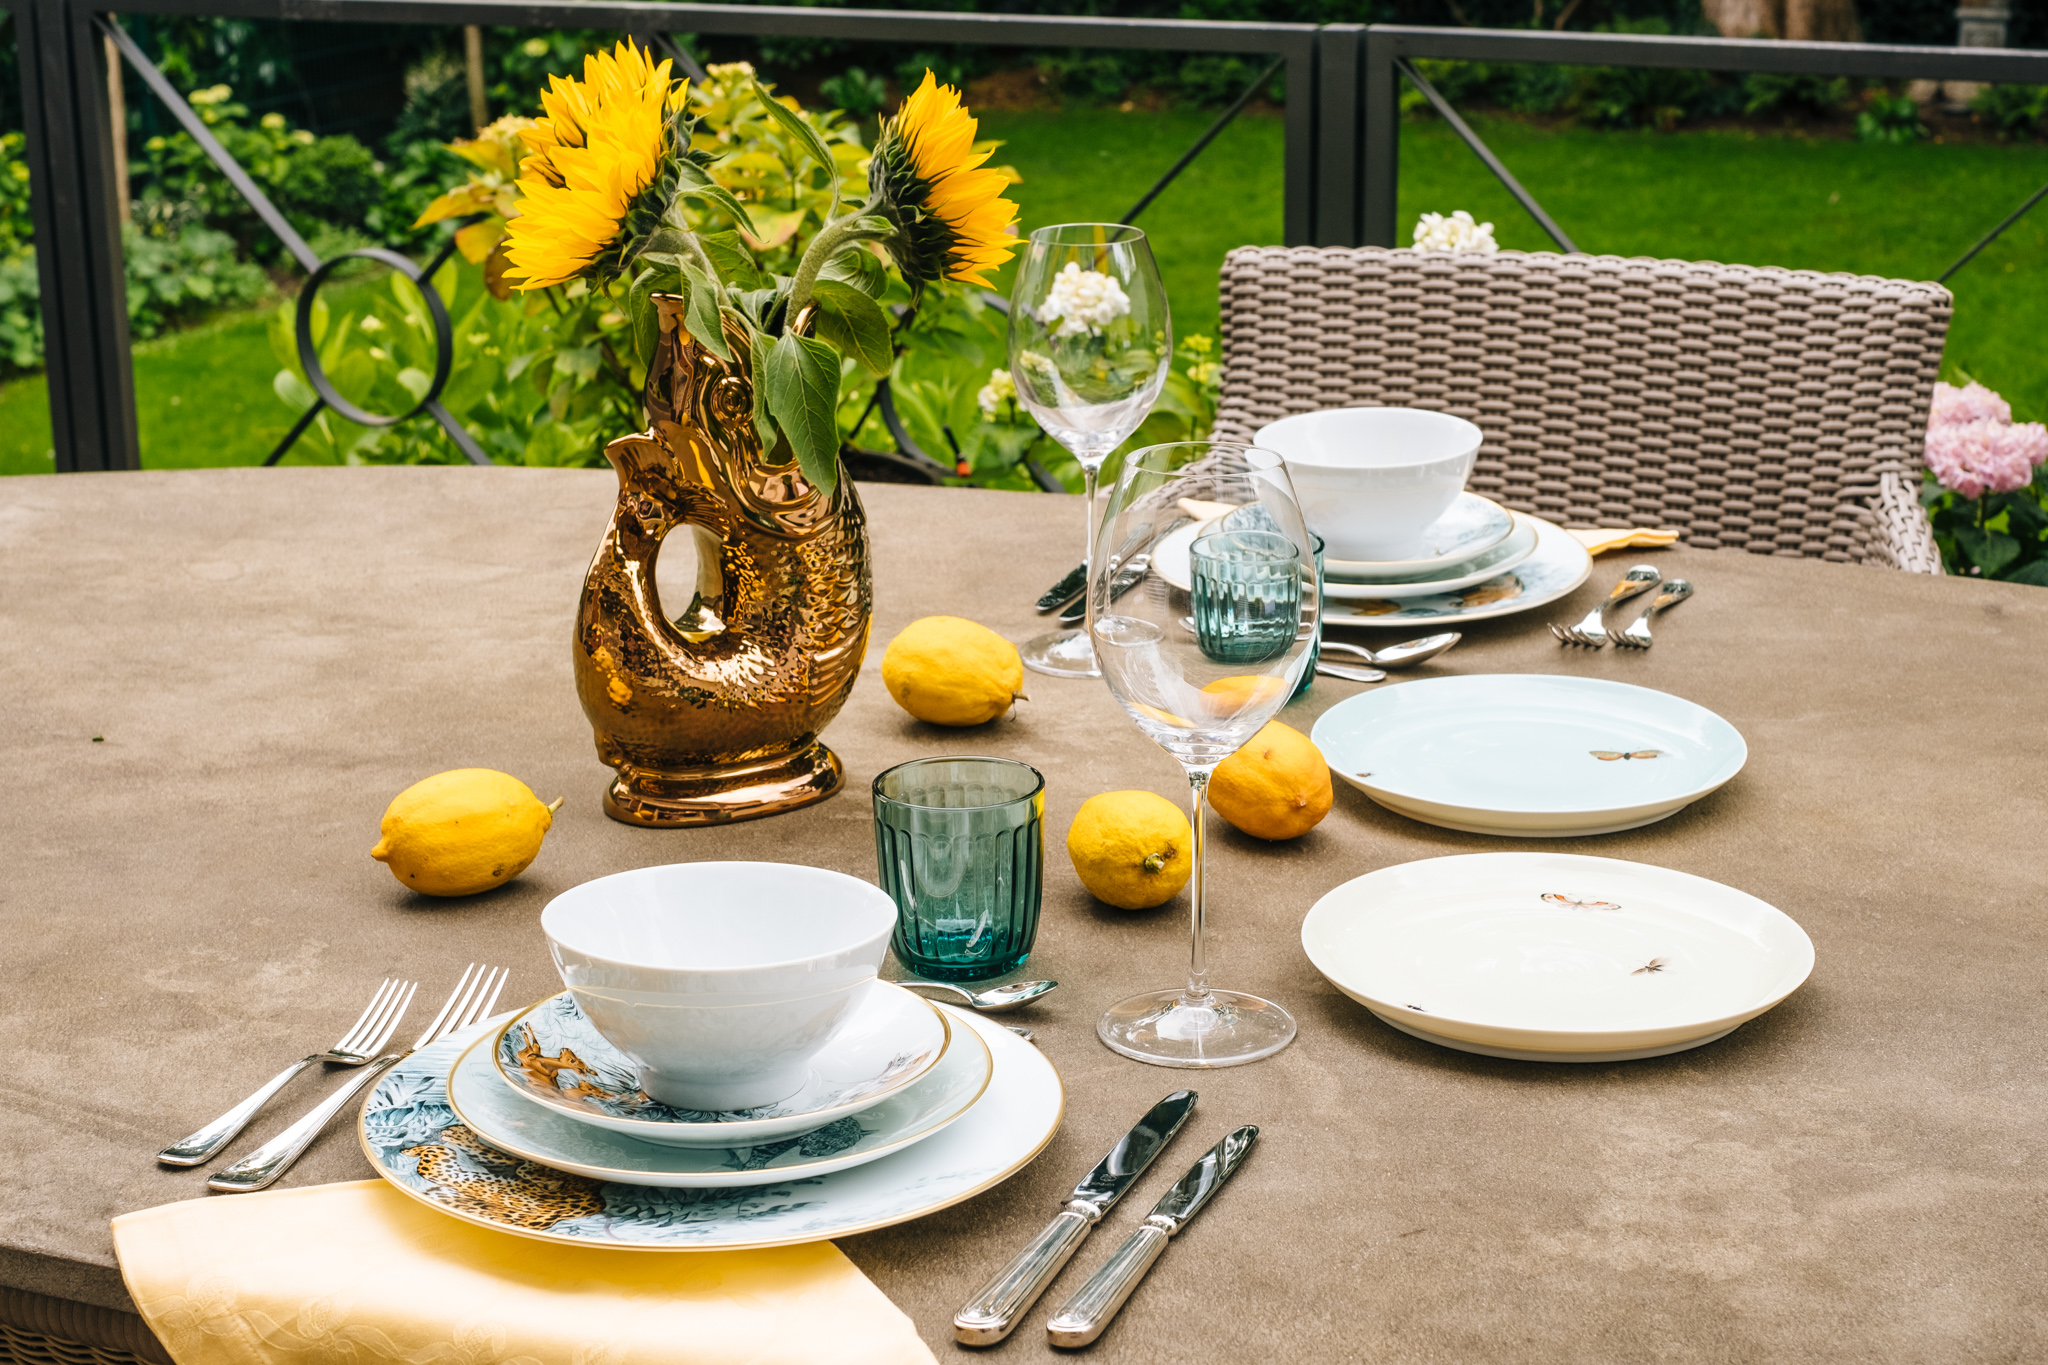 Eye Of The Tiger Sommerliche Tischdekoration In Gelb Mit Dem Hermes Porzellan Carnets D Equateur Lieblingsstil